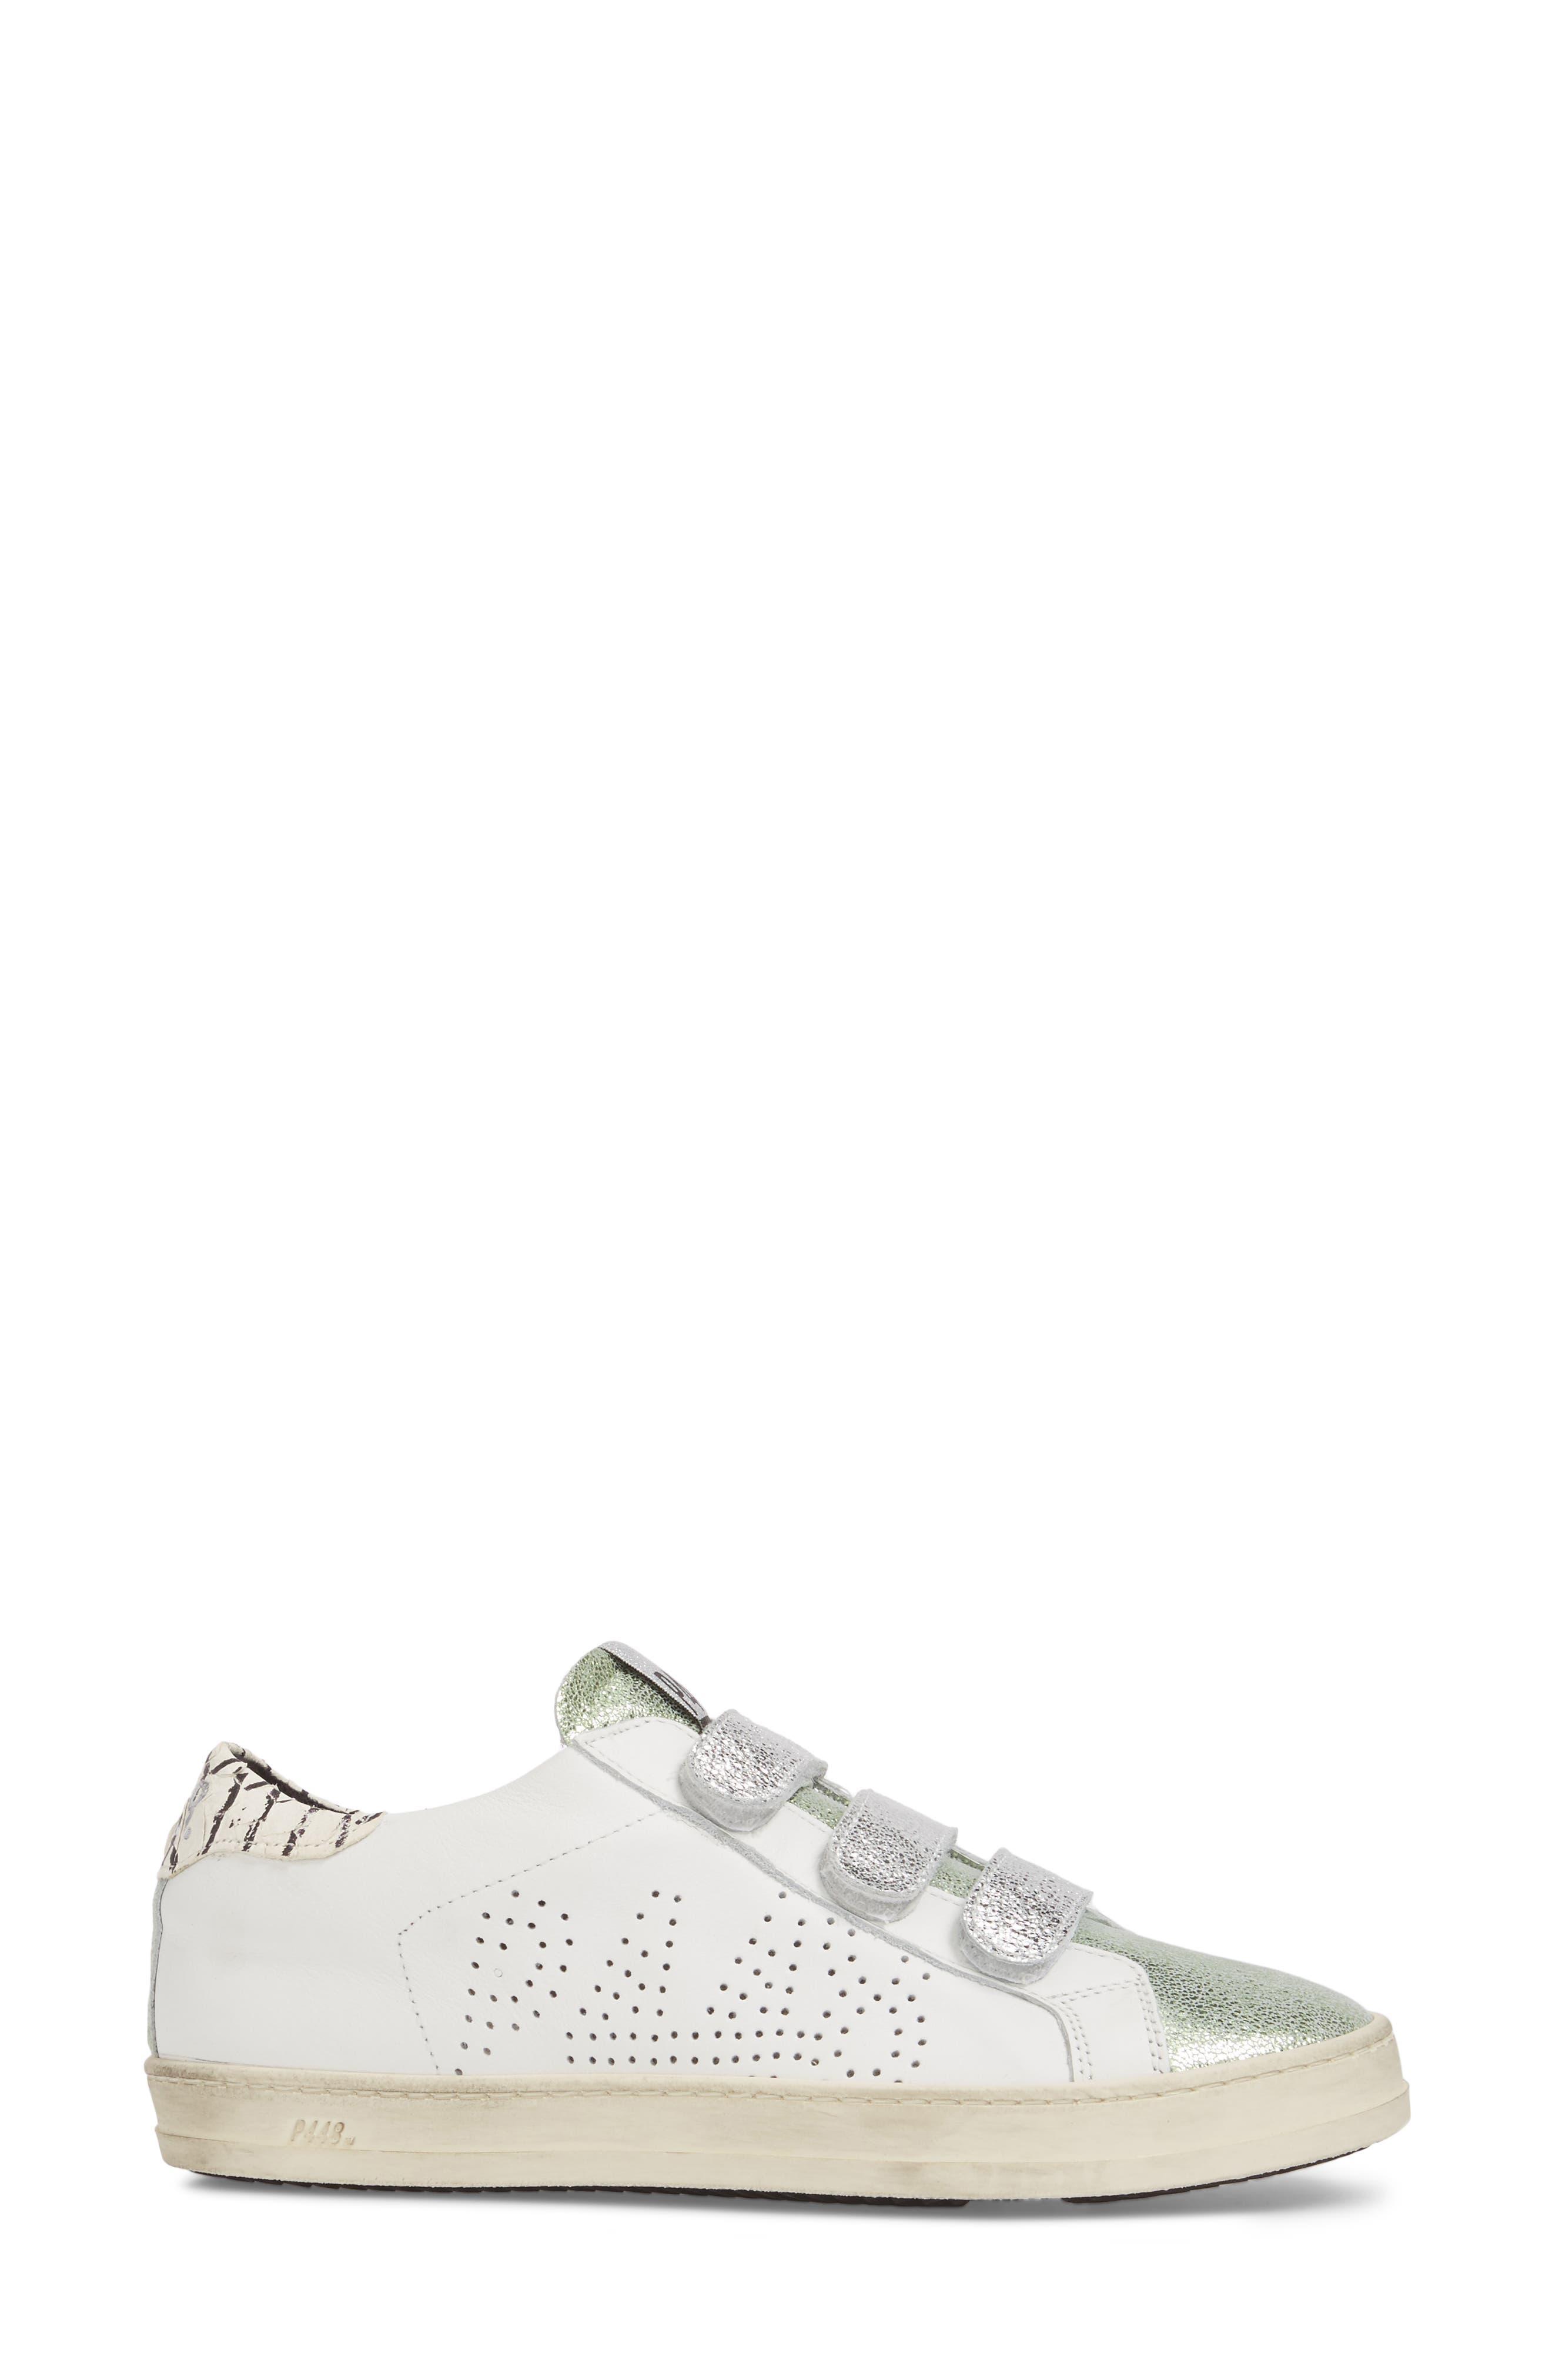 Ralph Sneaker,                             Alternate thumbnail 3, color,                             Green